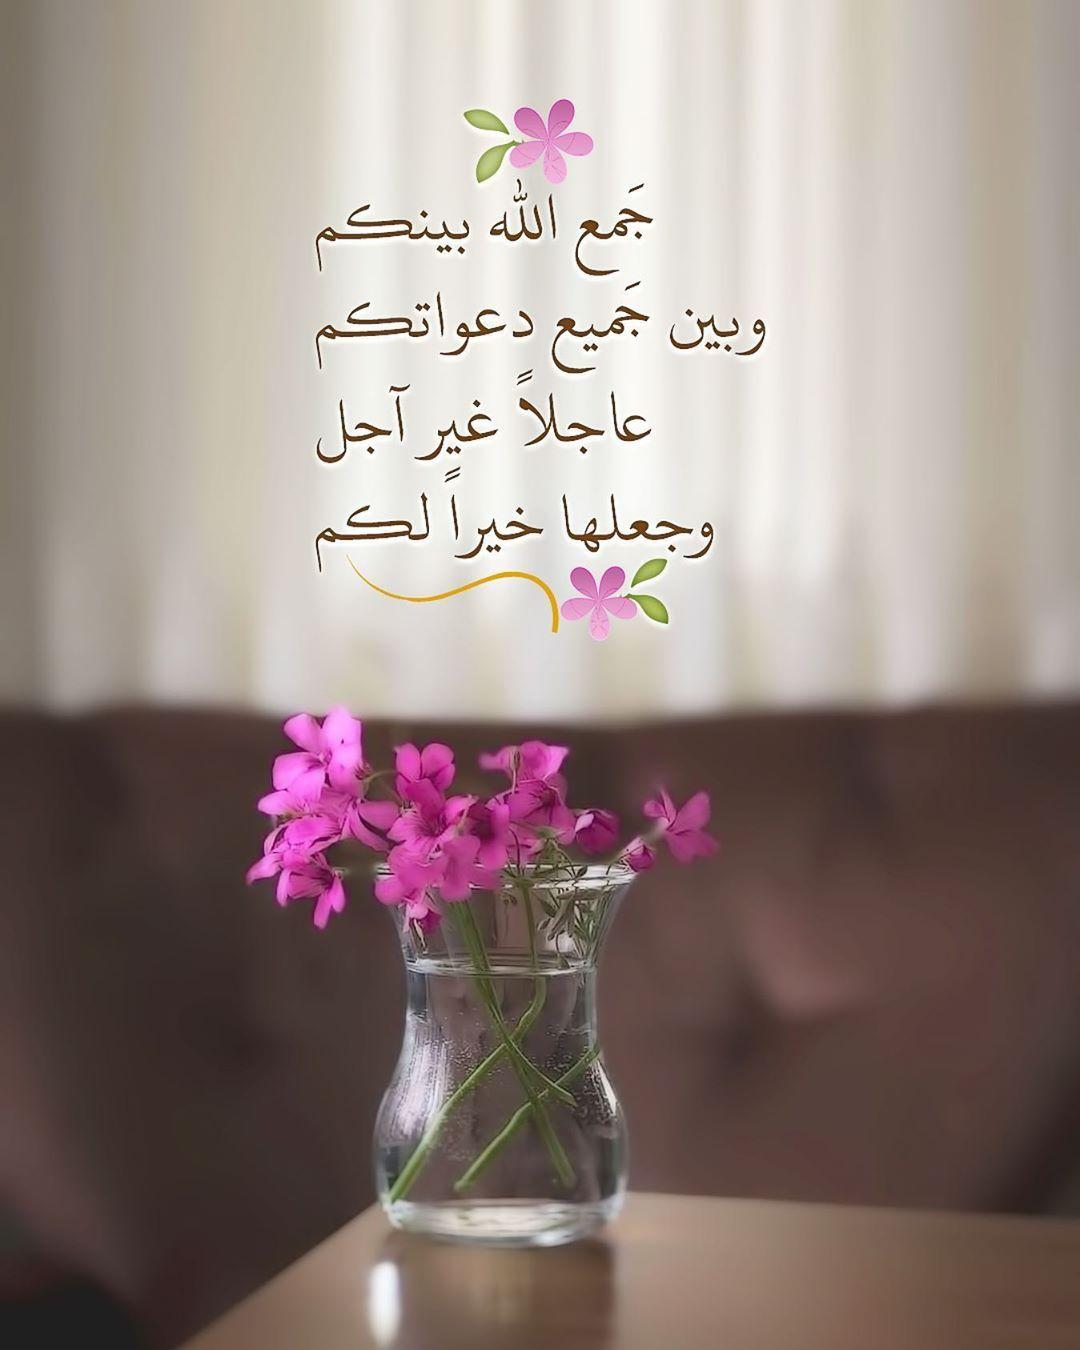 2 499 Likes 52 Comments Pearla0203 On Instagram ج م ع الله بينكم وبين ج ميع دعواتكم عاجلا ع ير Good Morning Arabic Islamic Images Islamic Pictures